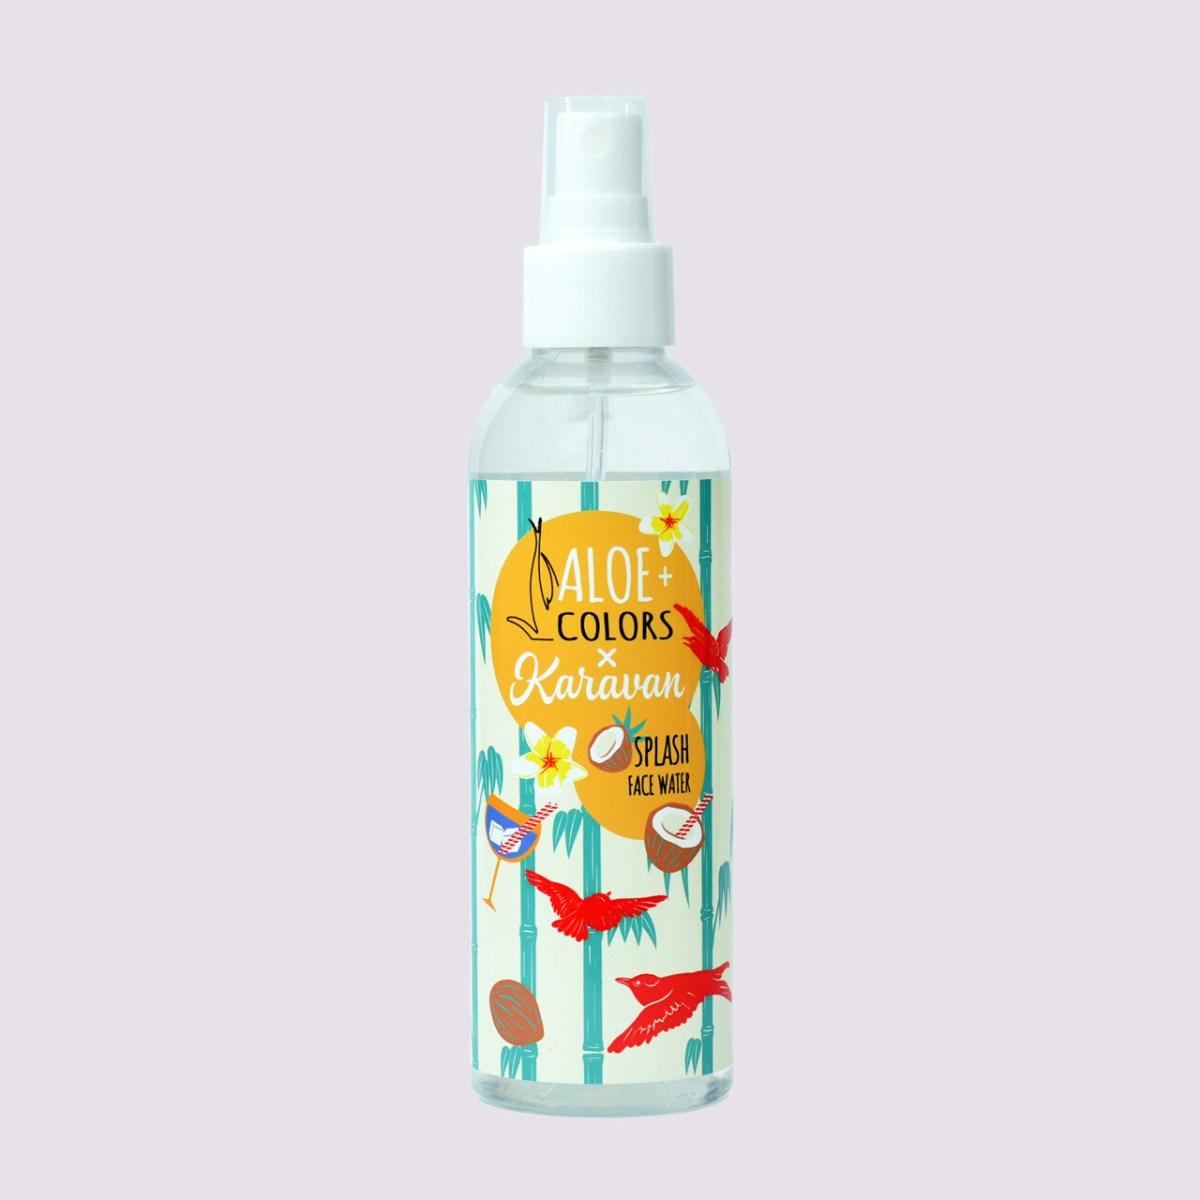 Aloe+Colors x karavan splash face water 200ml